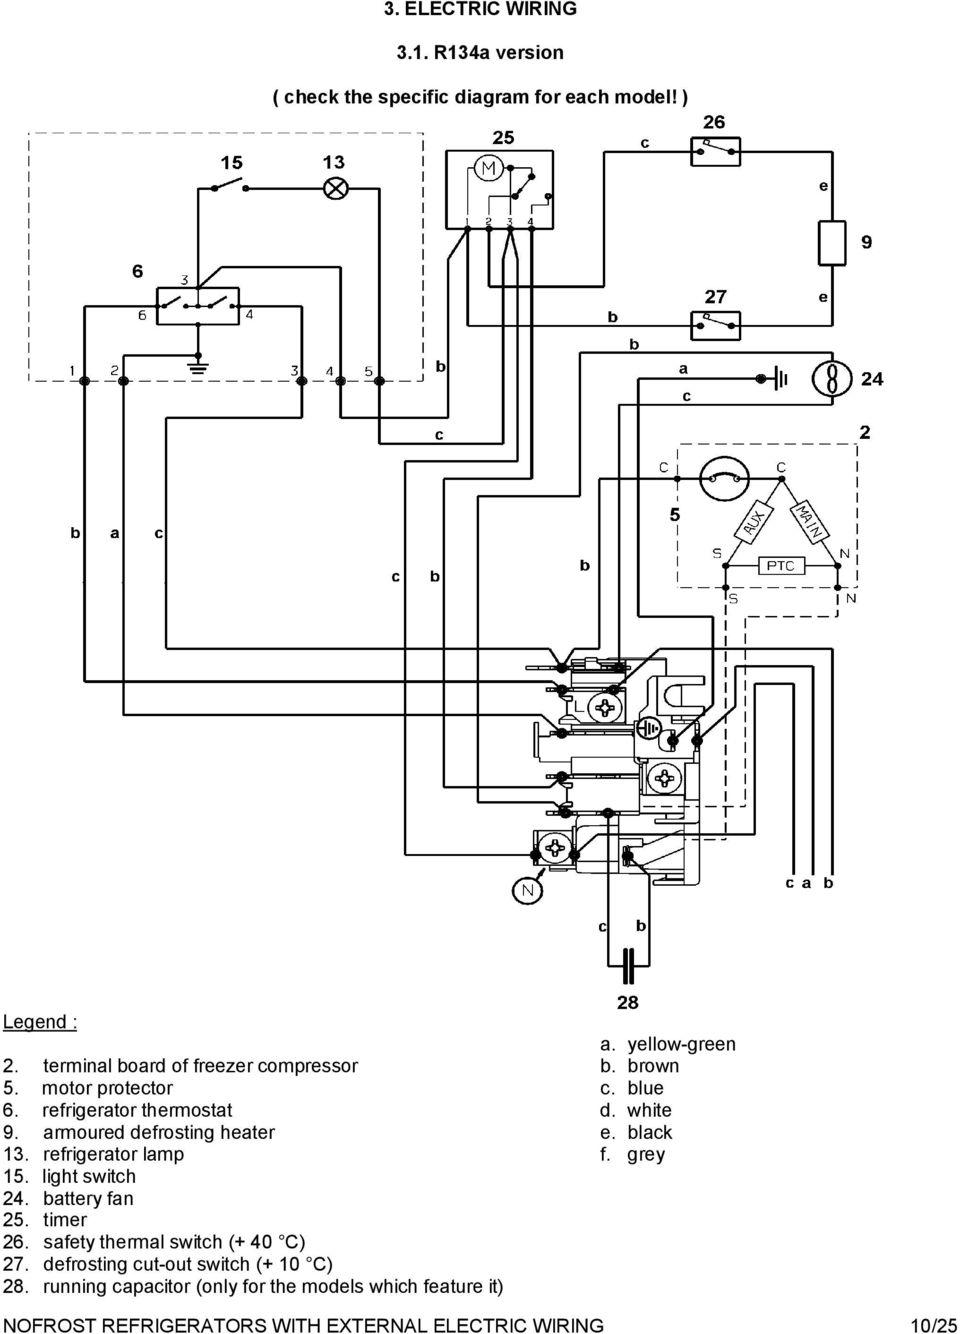 medium resolution of armoured defrosting heater e black 13 refrigerator lamp f grey 15 light